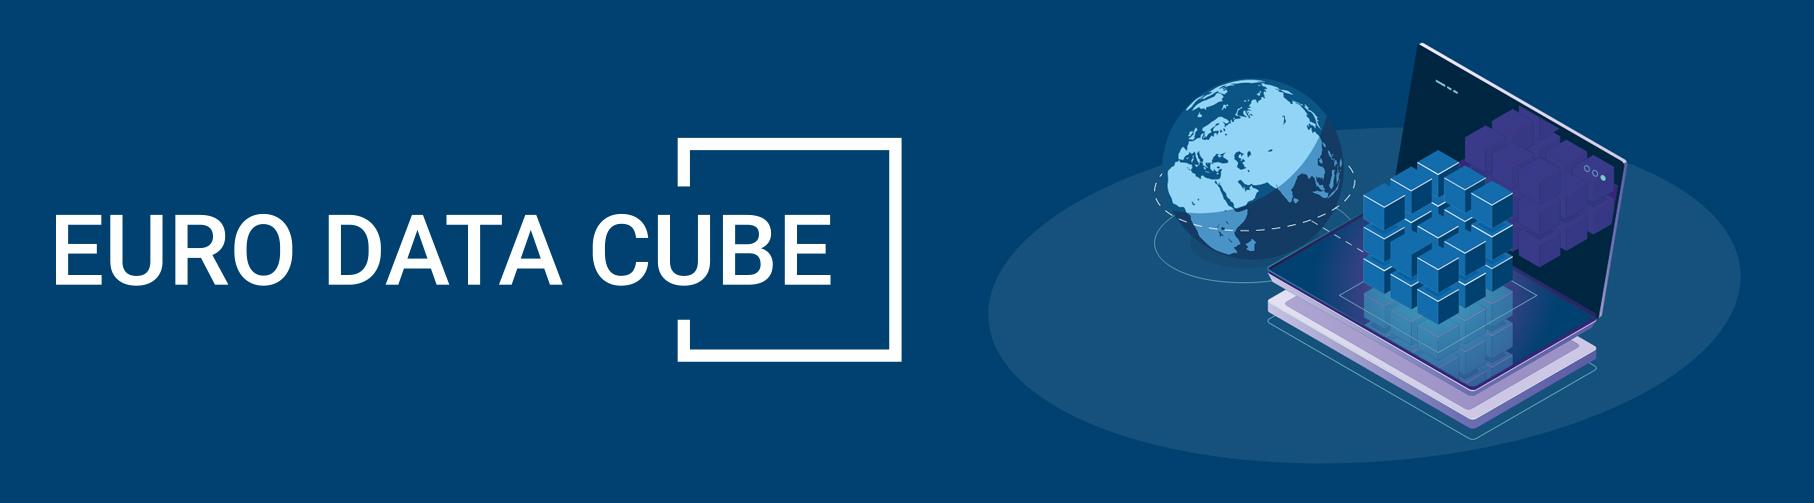 20440c99-e00d-11e7-a98f-06b2d989fe84%2F1578402087907-Euro+Data+Cube.jpg